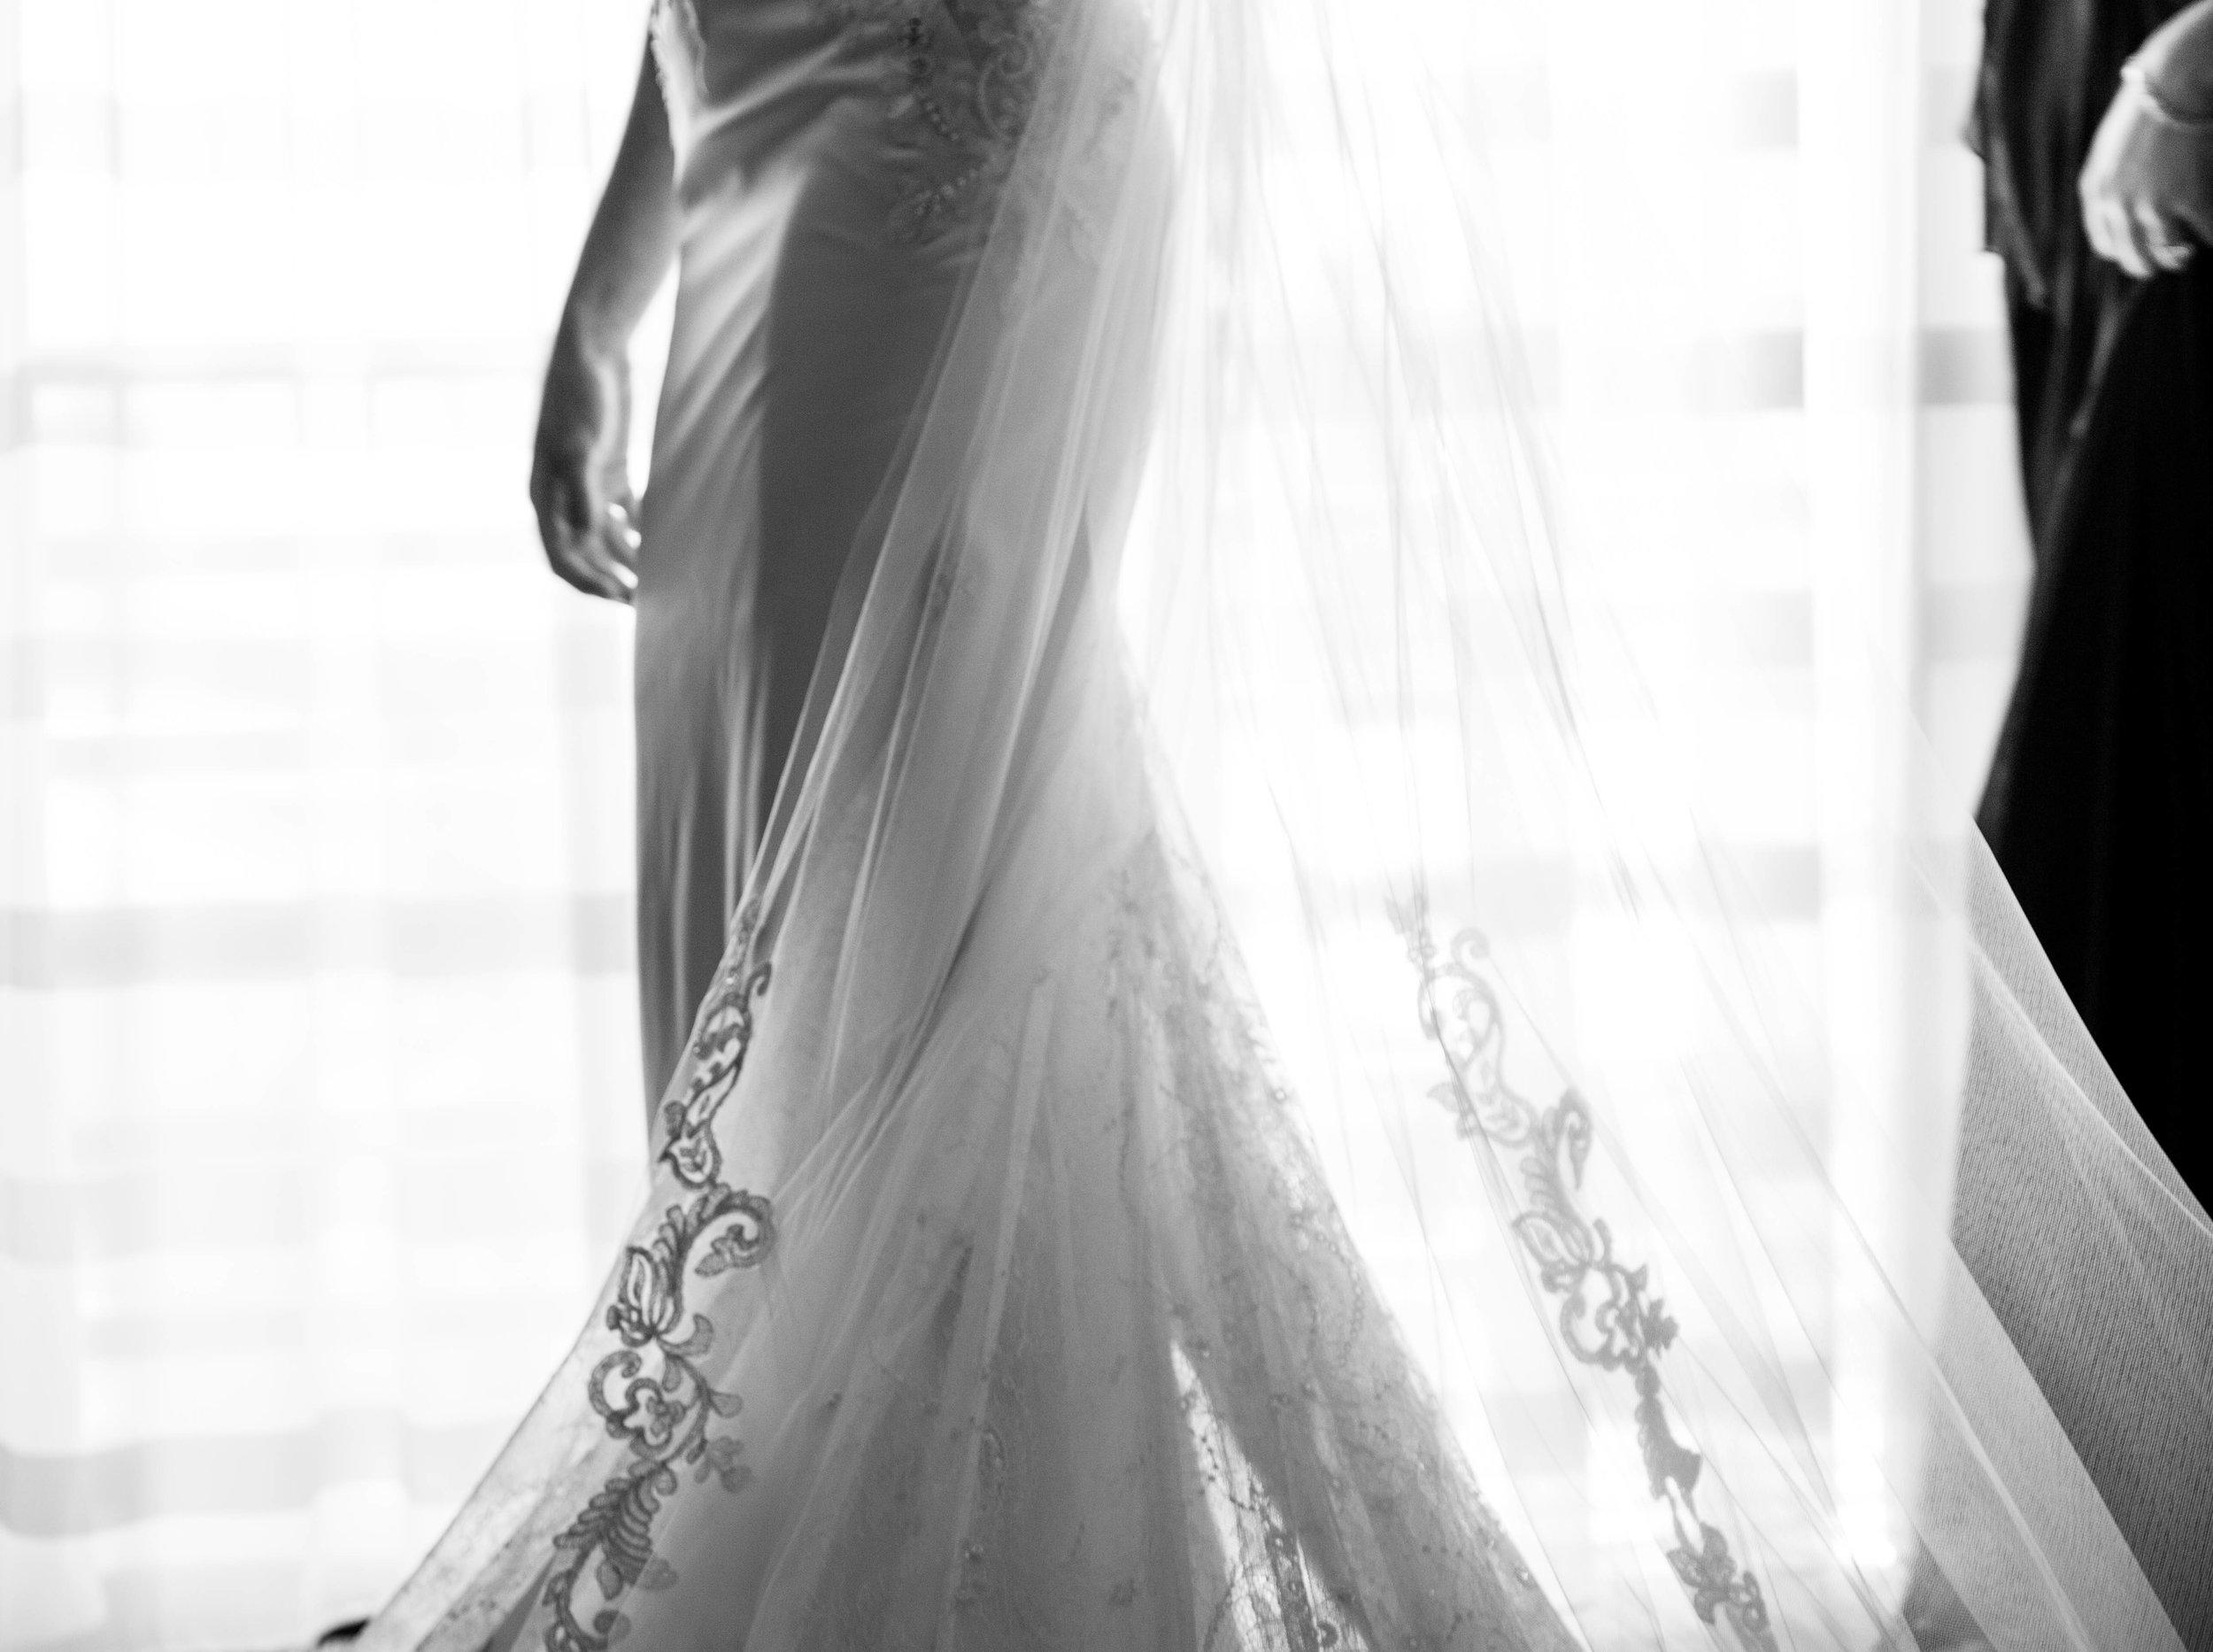 kate dress2 (1 of 1).jpg